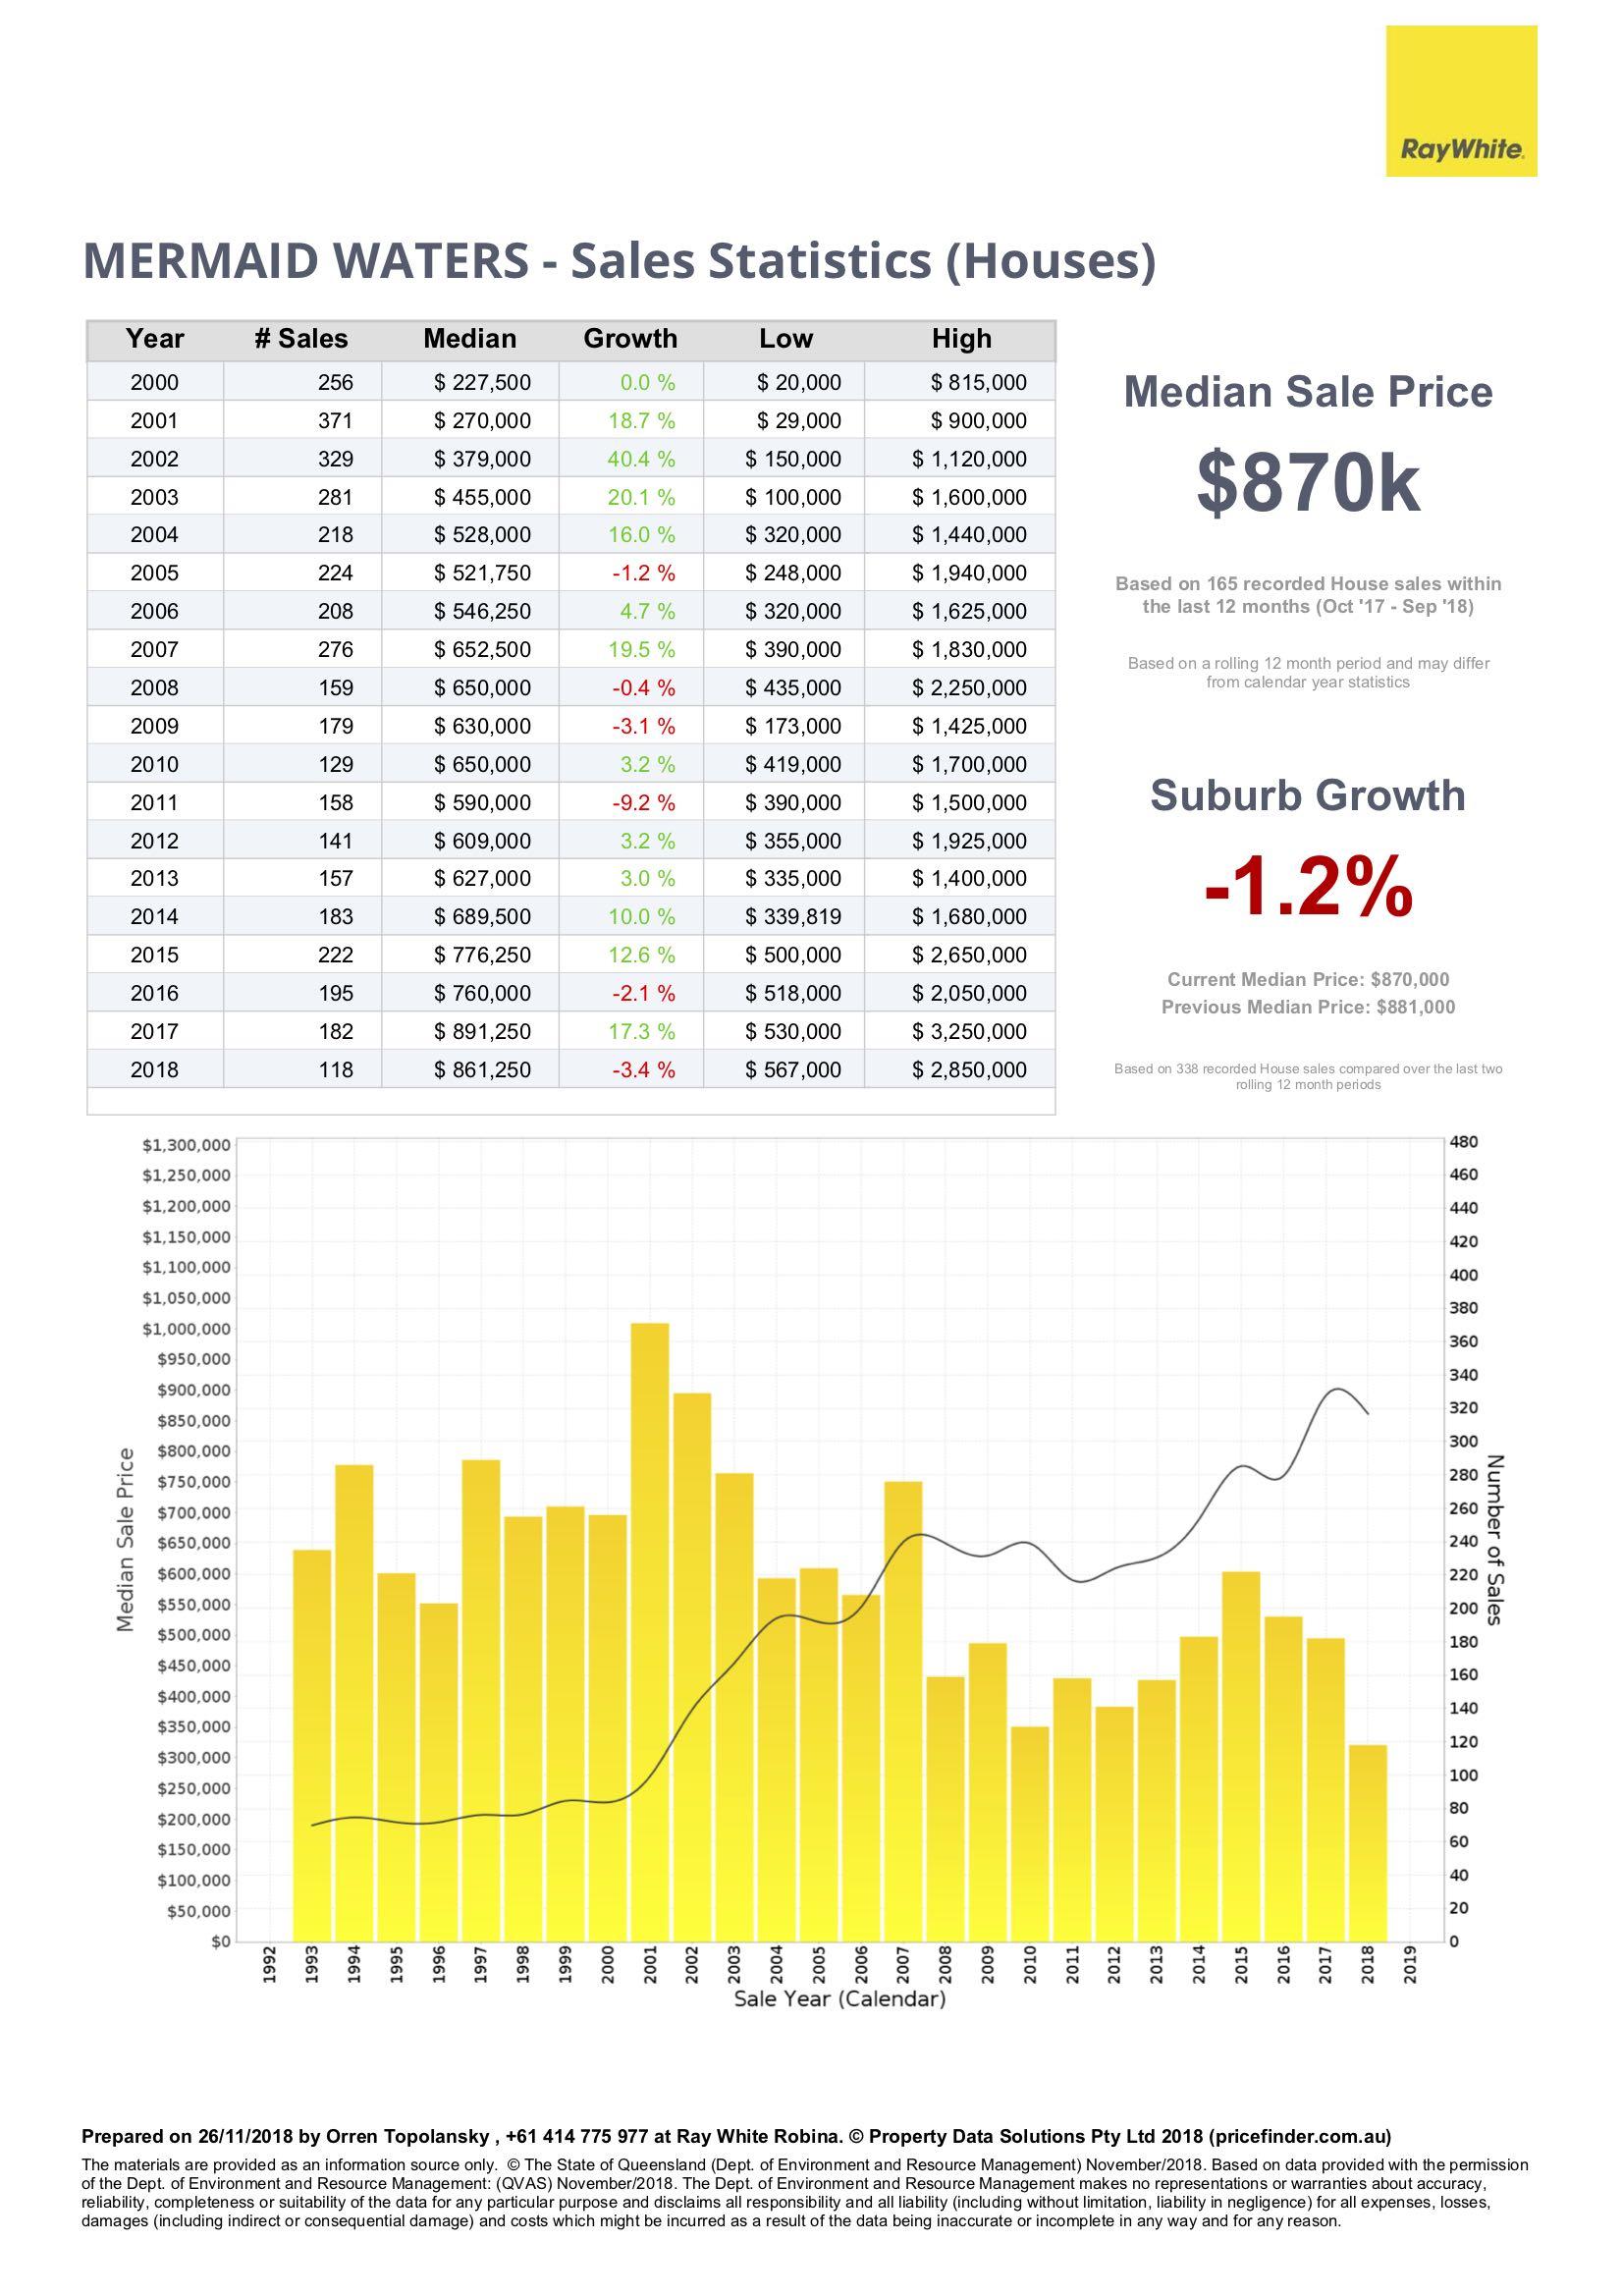 Price statistics for houses in Mermaid Waters, Gold Coast, Queensland